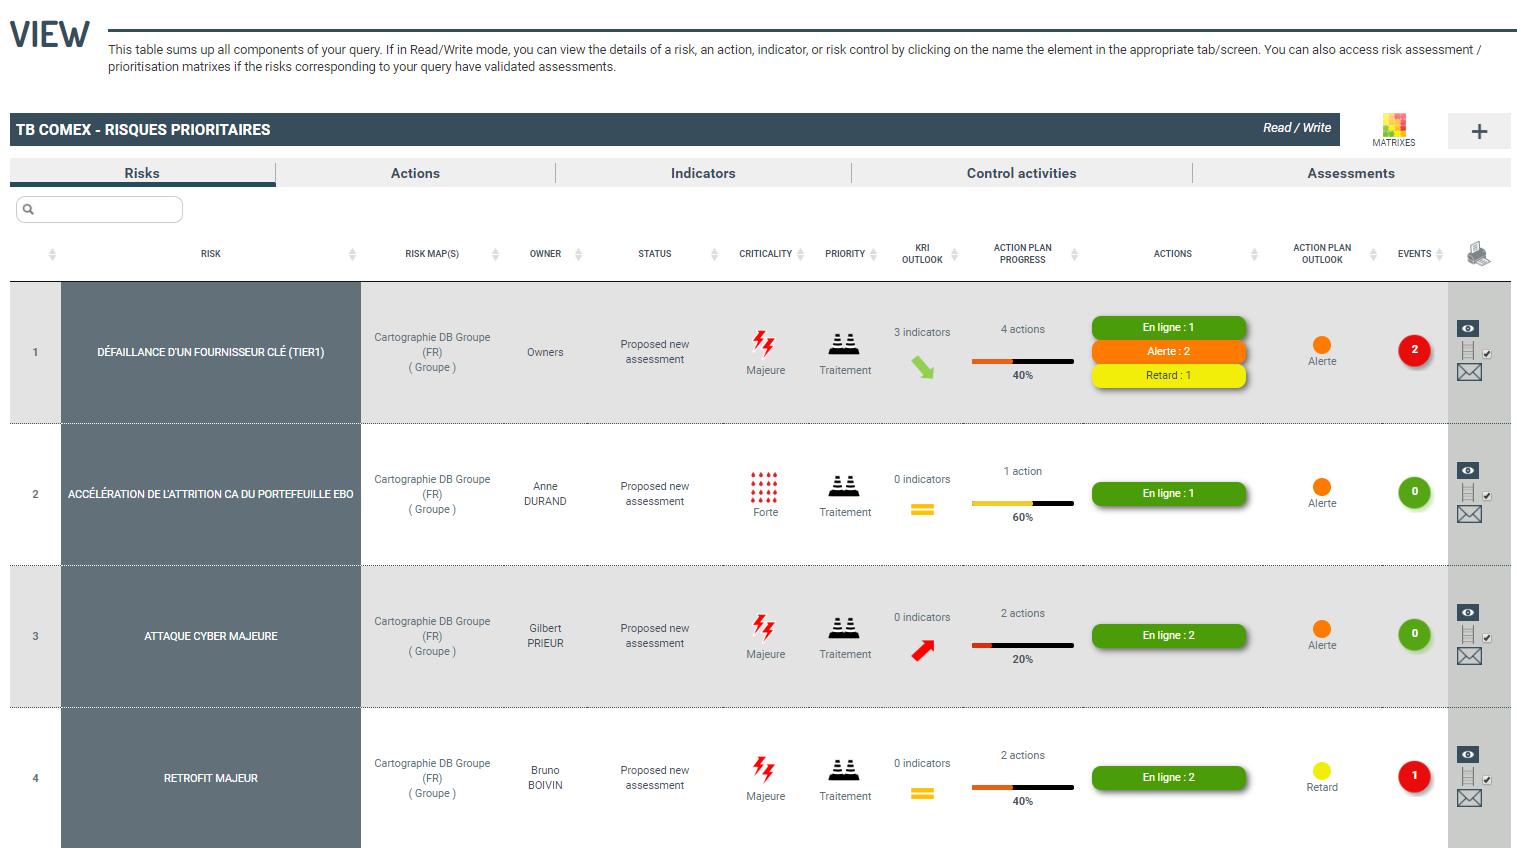 RMIS ArengiBox Risk Manager scopes